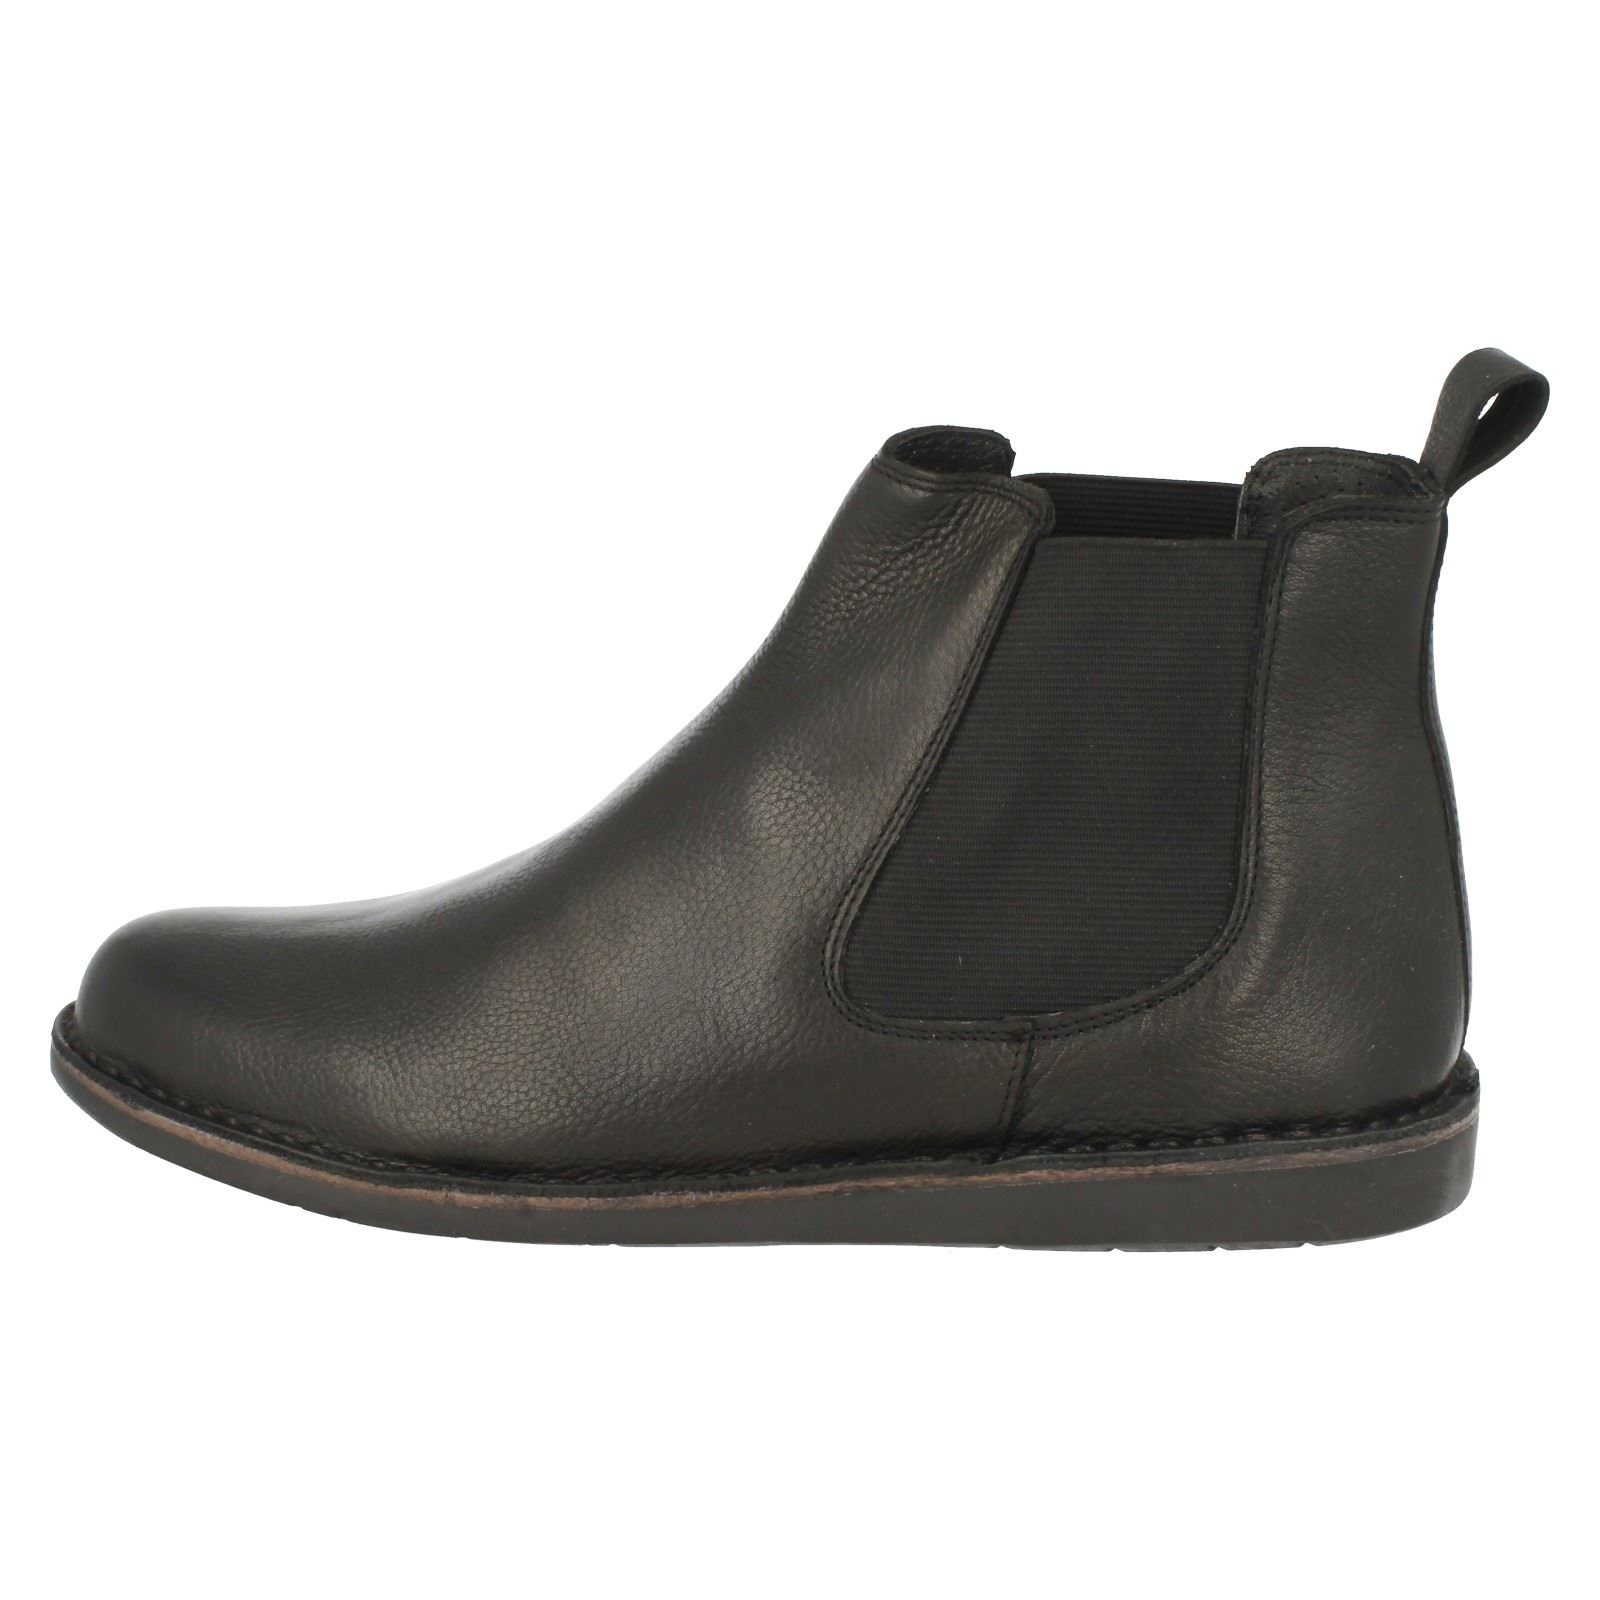 Mens-Padders-Pull-On-Chelsea-Boots-Jez thumbnail 3